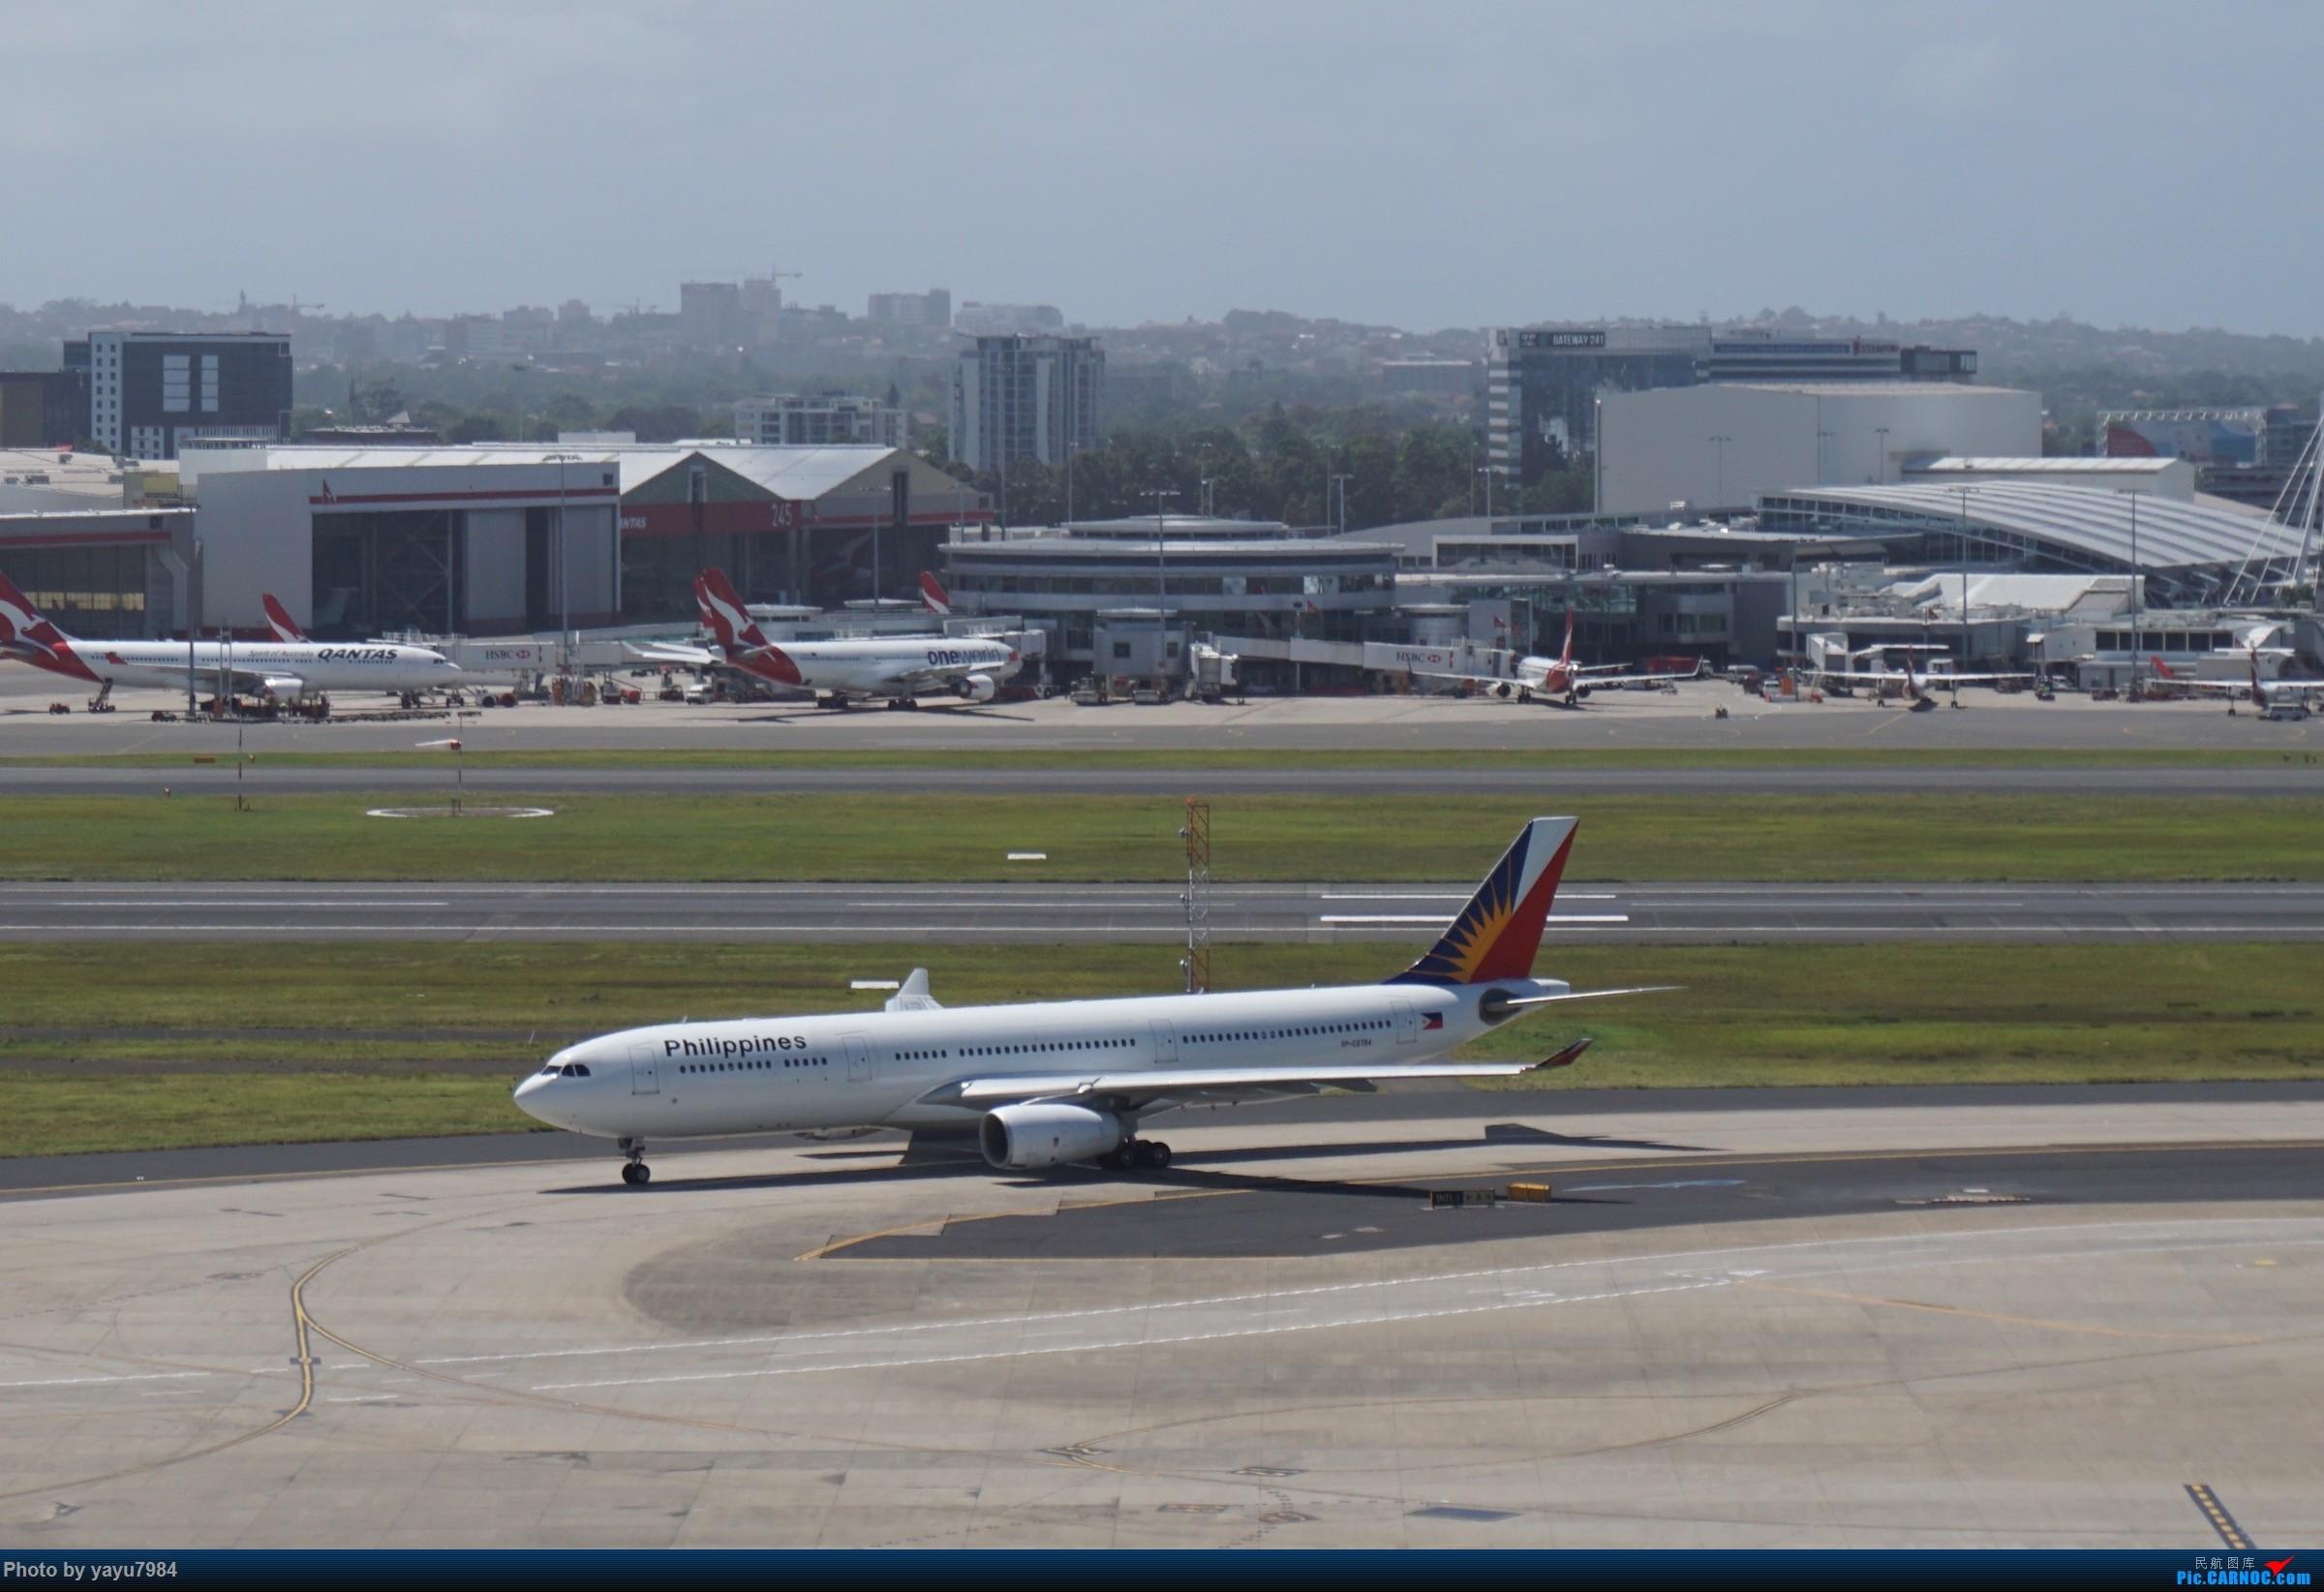 Re:[原创][SYD] 停车楼顶看宽体 AIRBUS A330-300 RP-C8784 澳大利亚悉尼金斯福德·史密斯机场